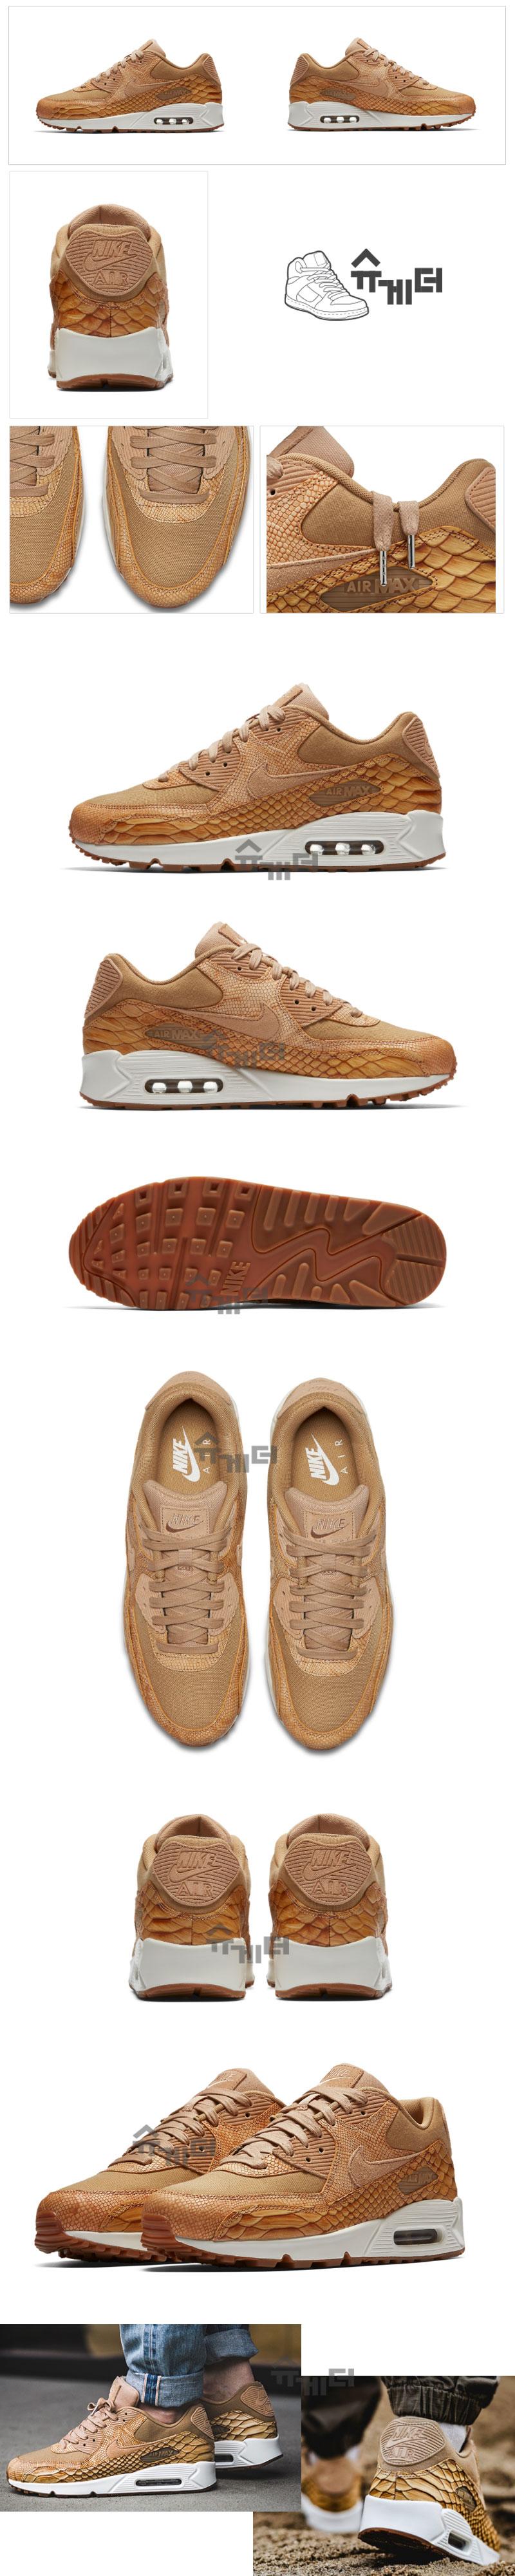 sports shoes 04400 aca7c 나이키 에어 맥스 90 프리미엄 레더 바체타 탄 Nike Air Max 90 Premium Leather AH8046-200